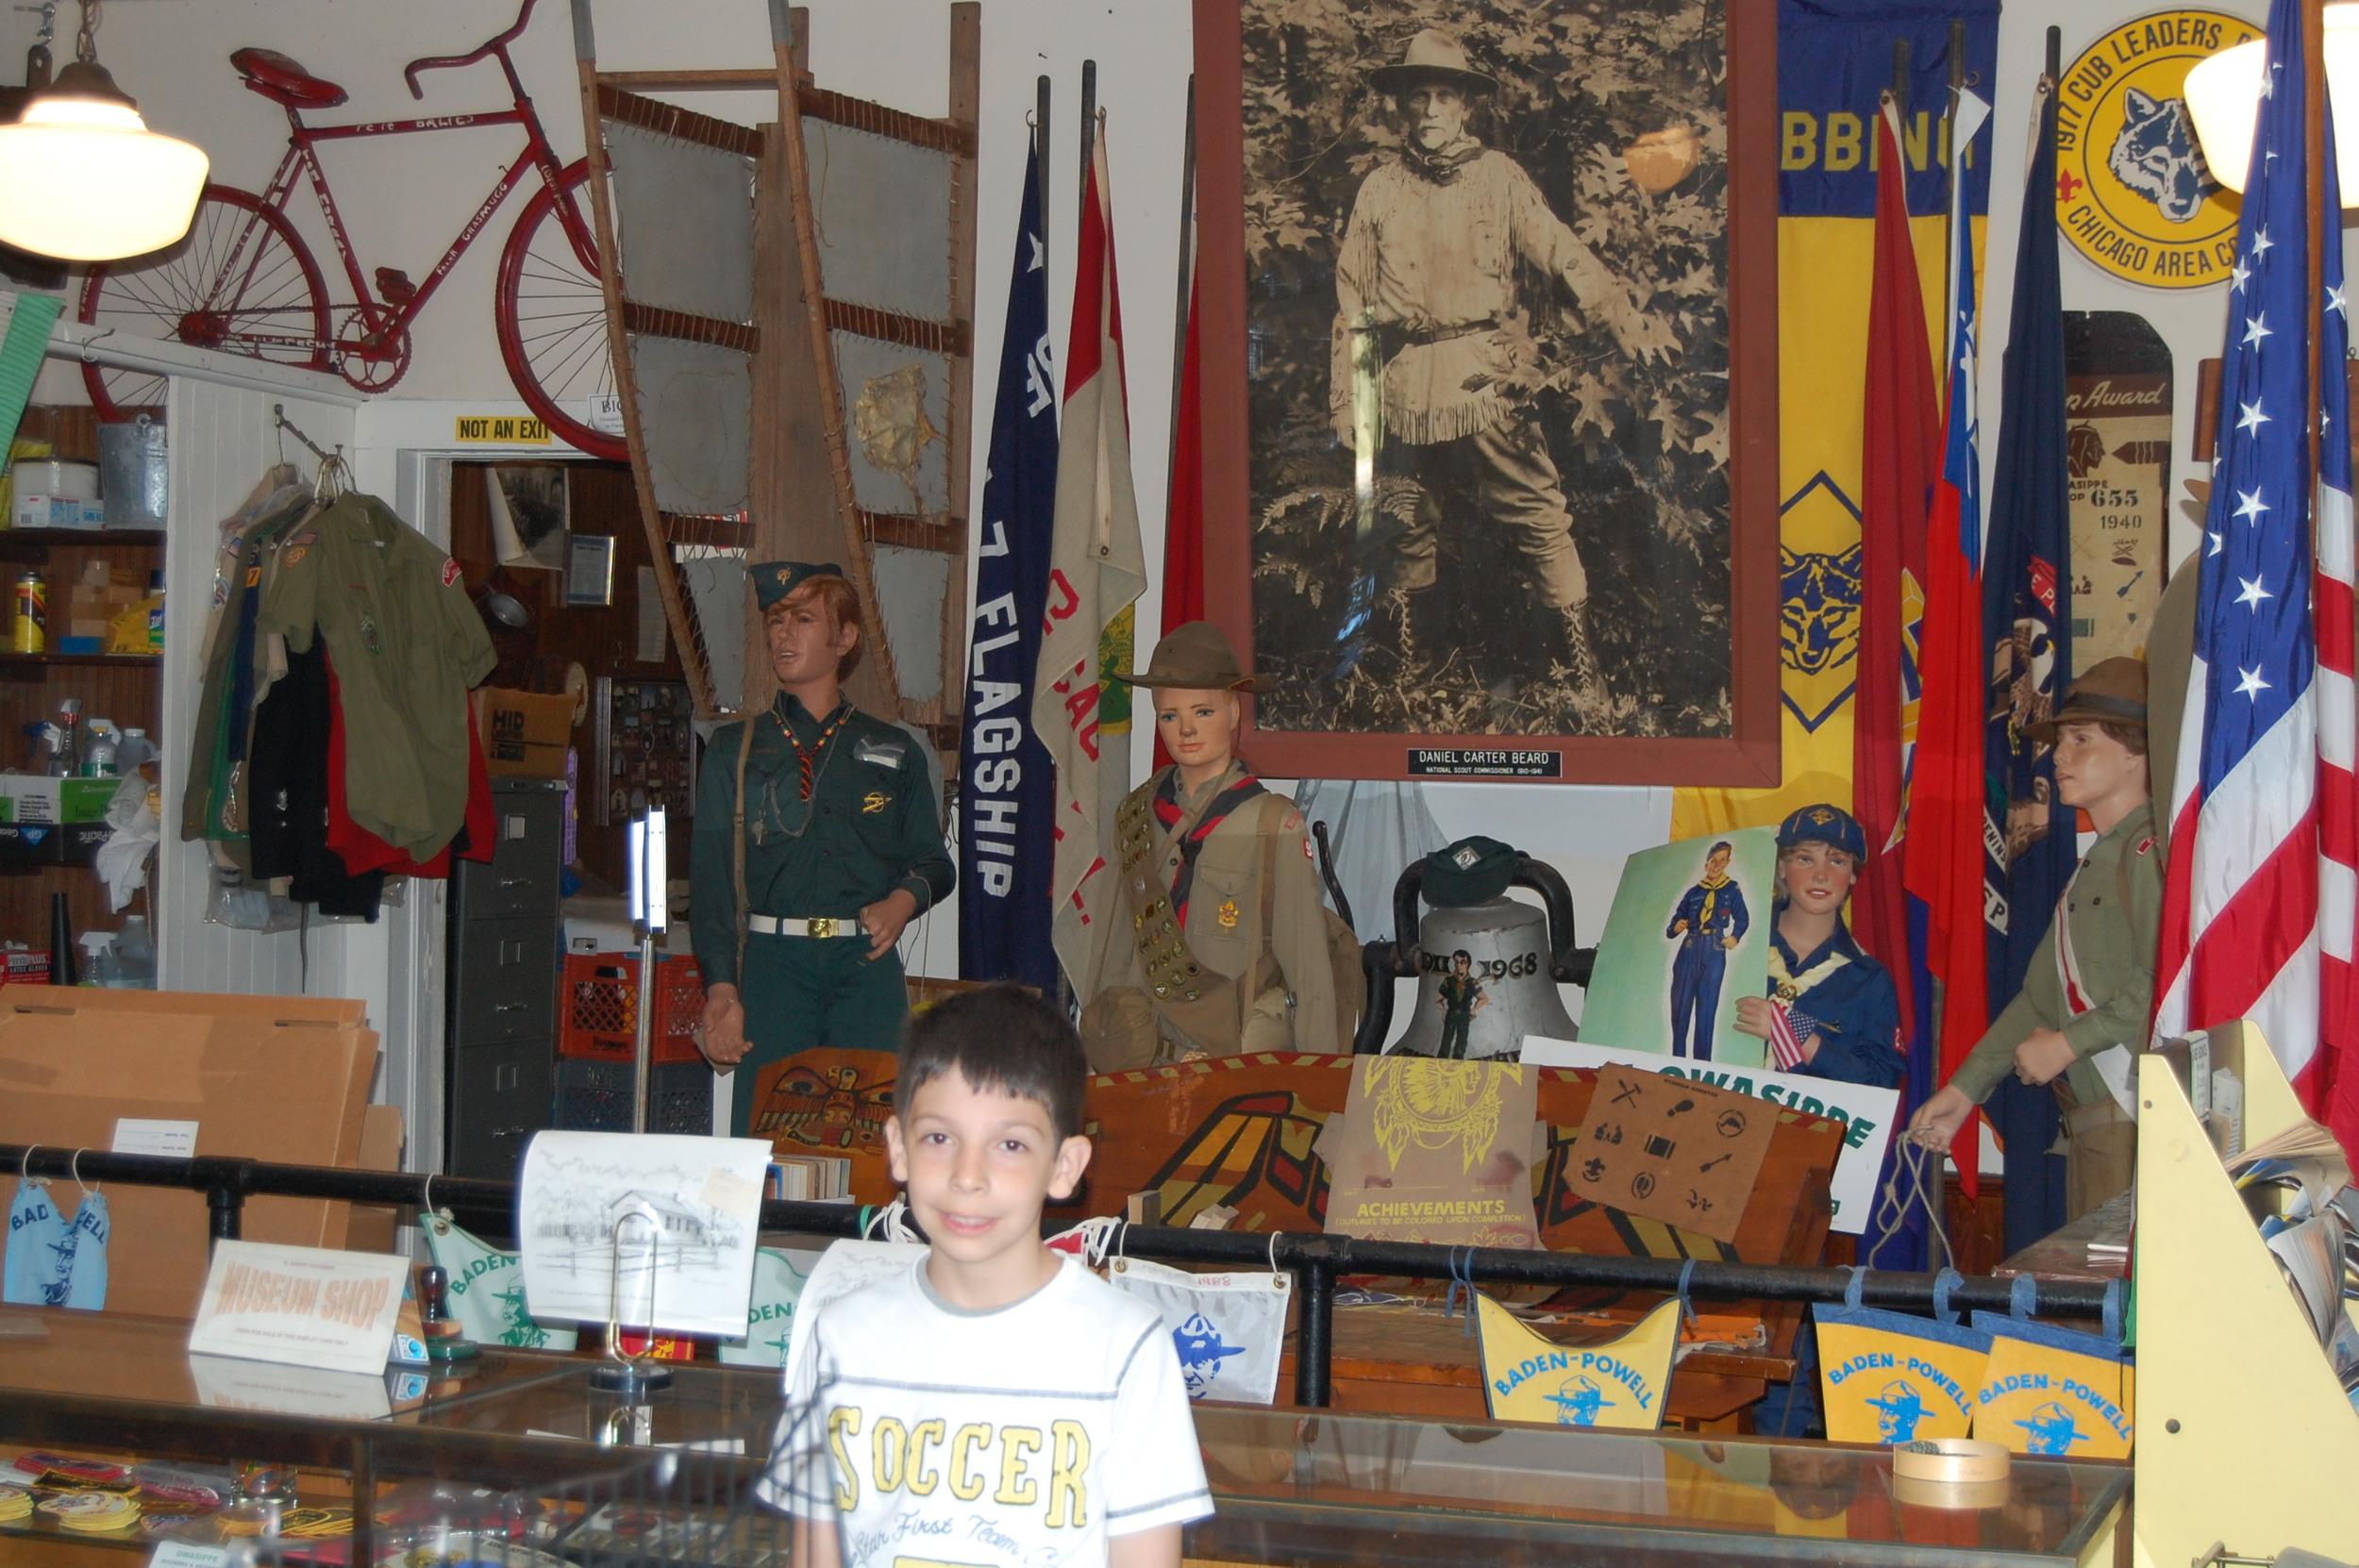 E Urner Goodman Scout Museum